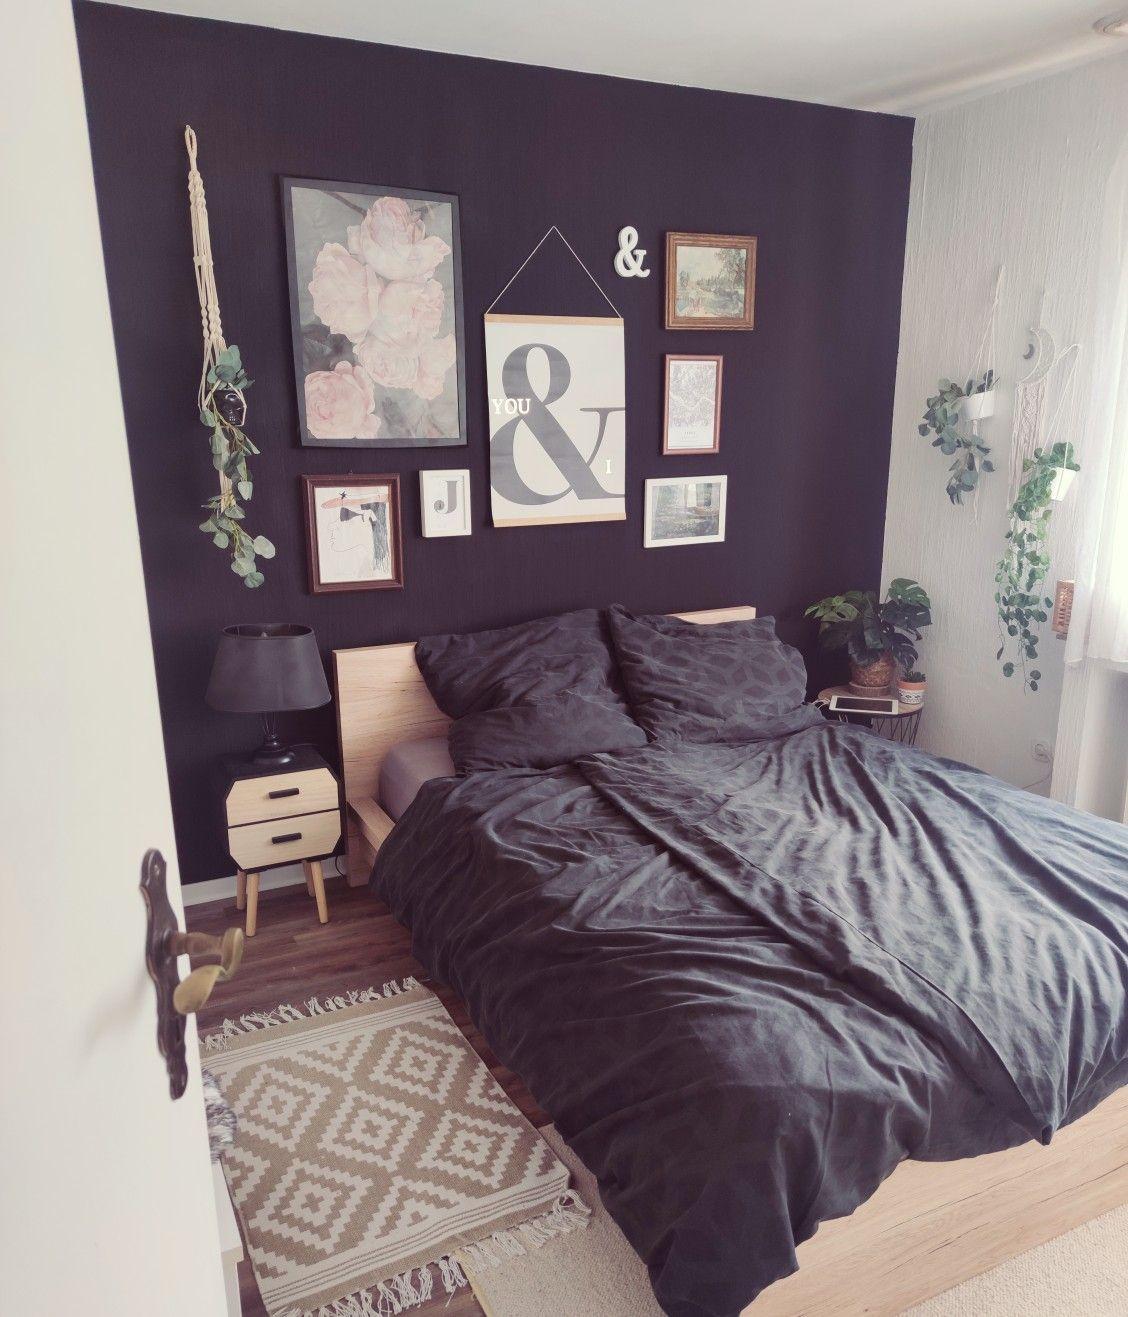 #bedroom#galerywall#blackwall#modern#boho#midcenturymodern#art#bedroominspiration